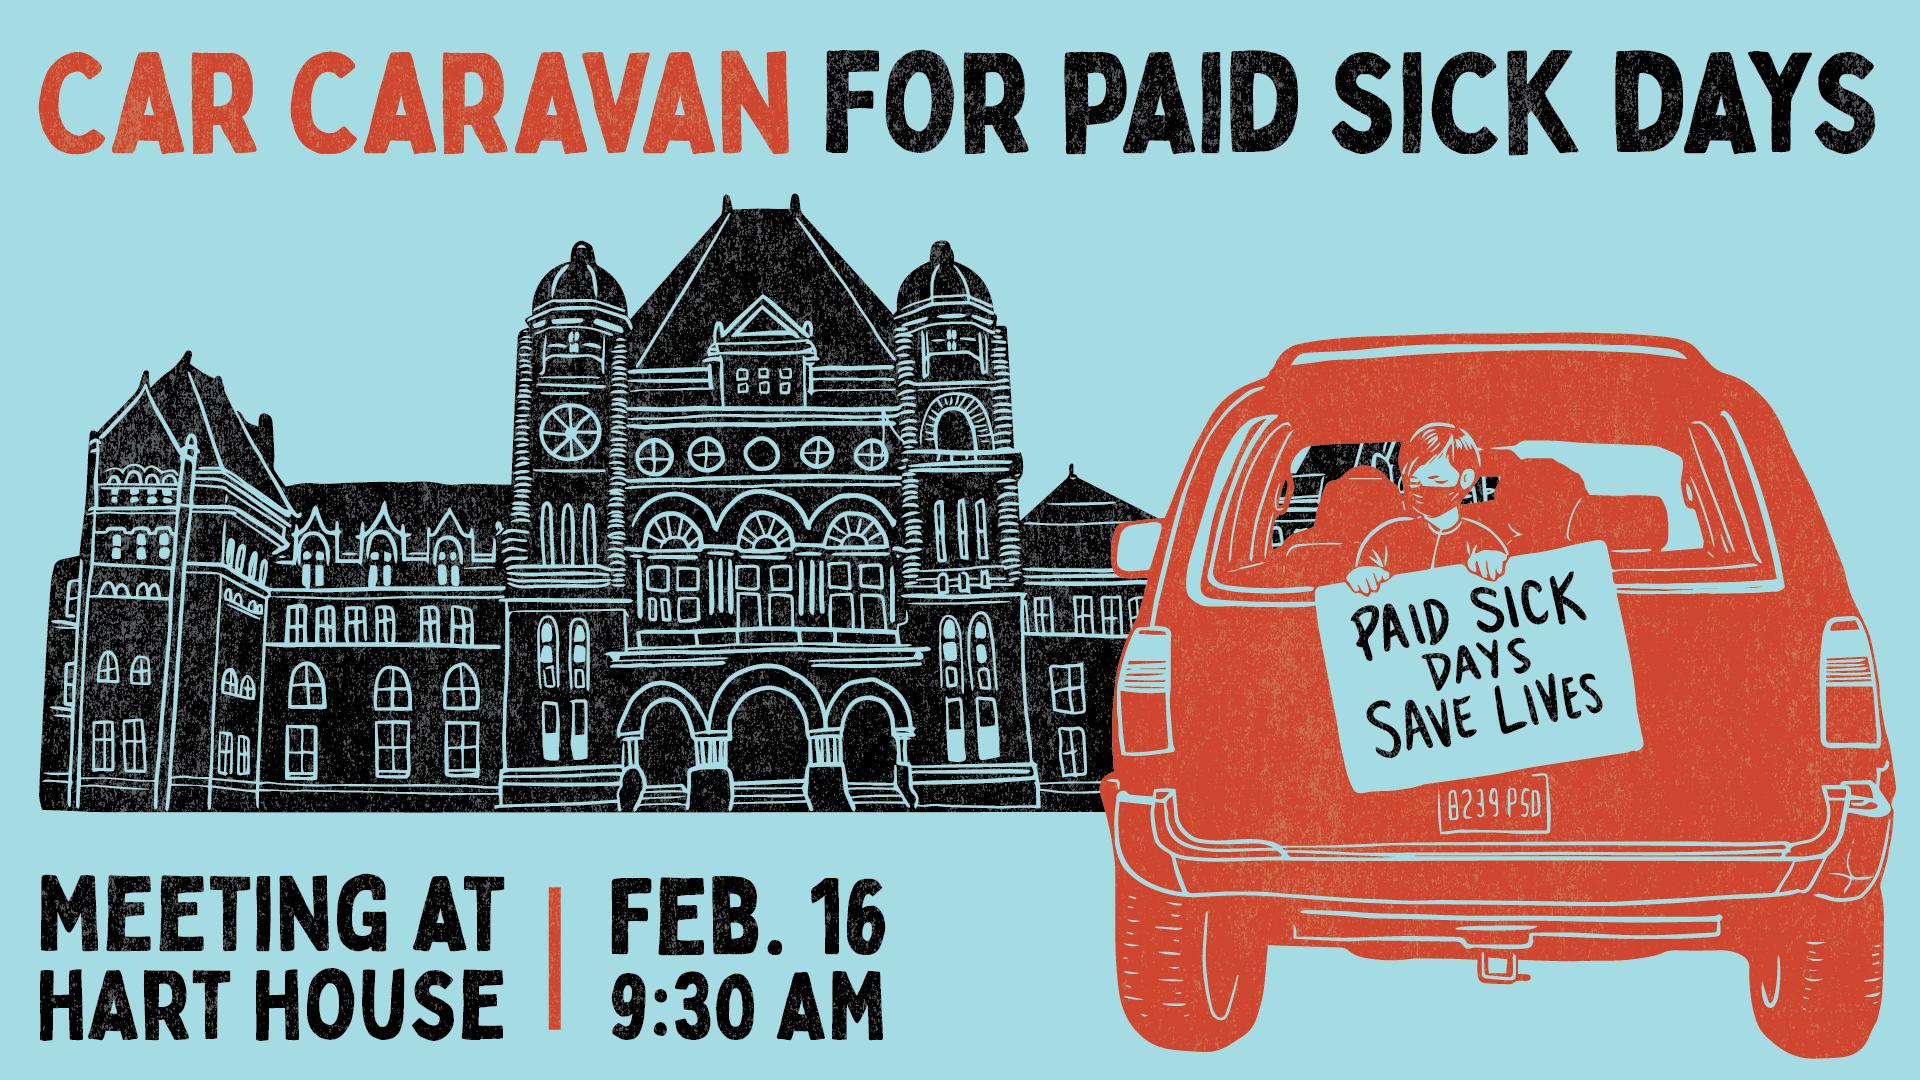 Car Caravan for Paid Sick Days on Feb. 16